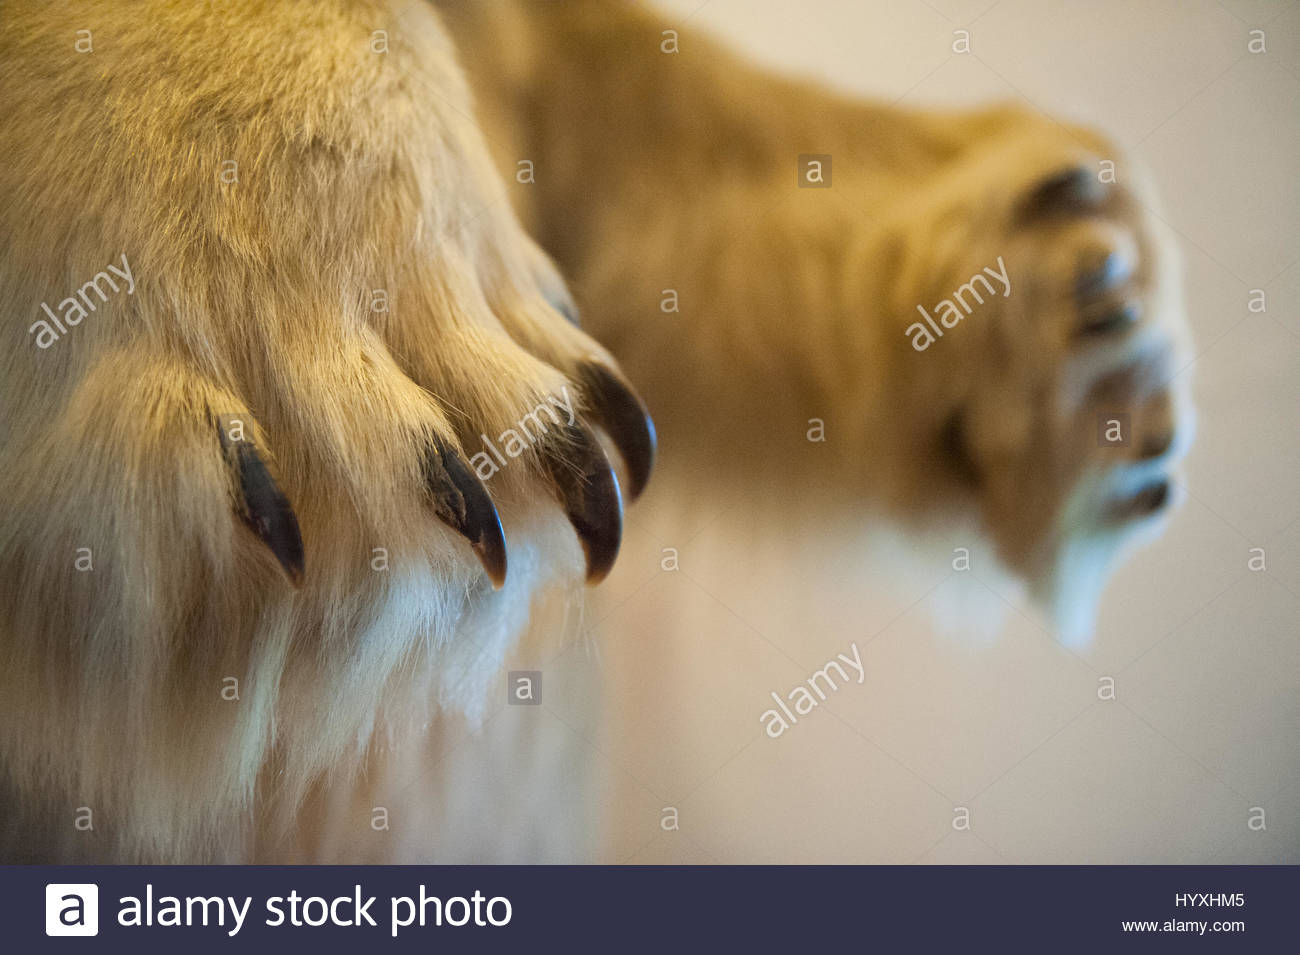 The paws of a stuffed polar bear, Ursus maritimus. - Stock Image